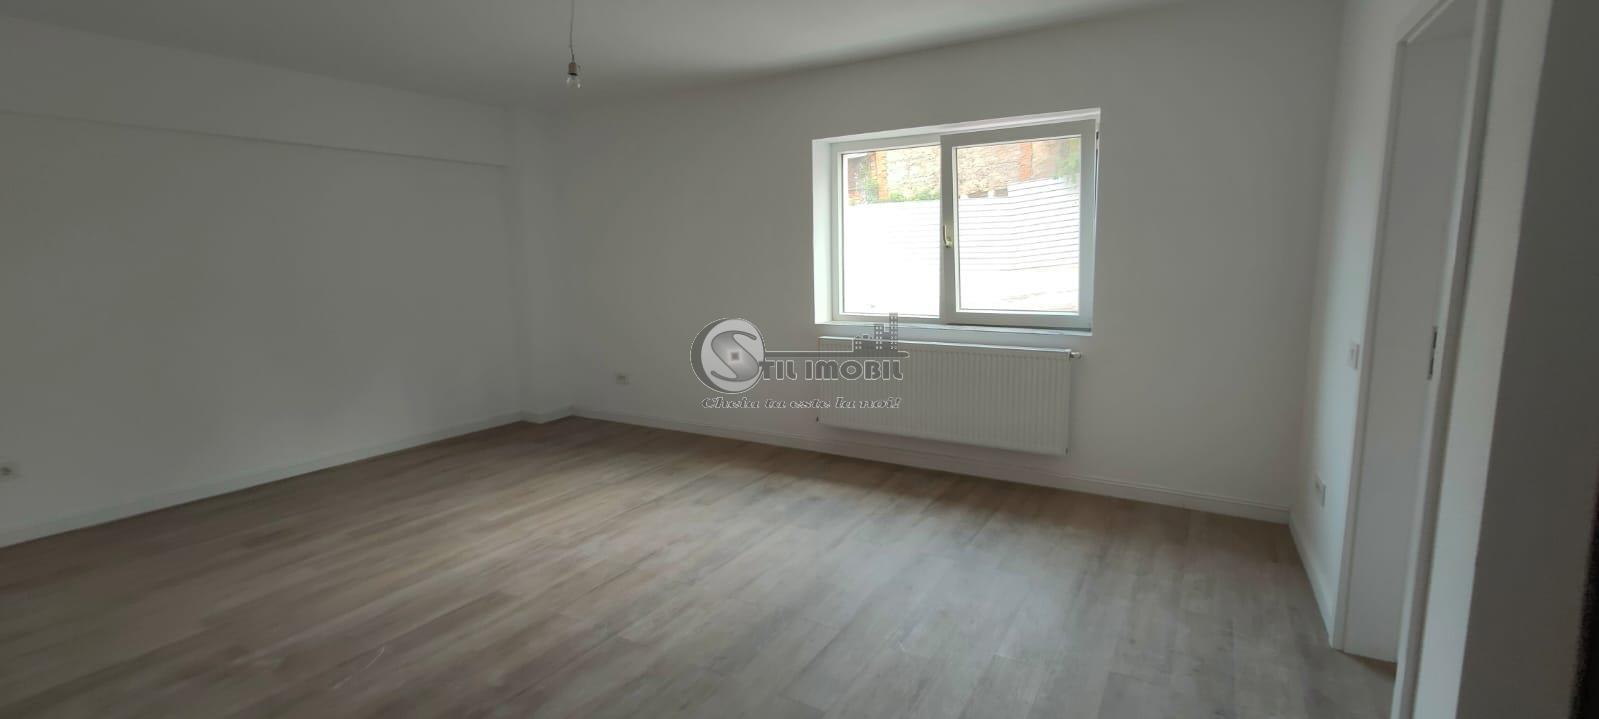 Apartament 1 camera,36mp, decomandat,Tatarasi